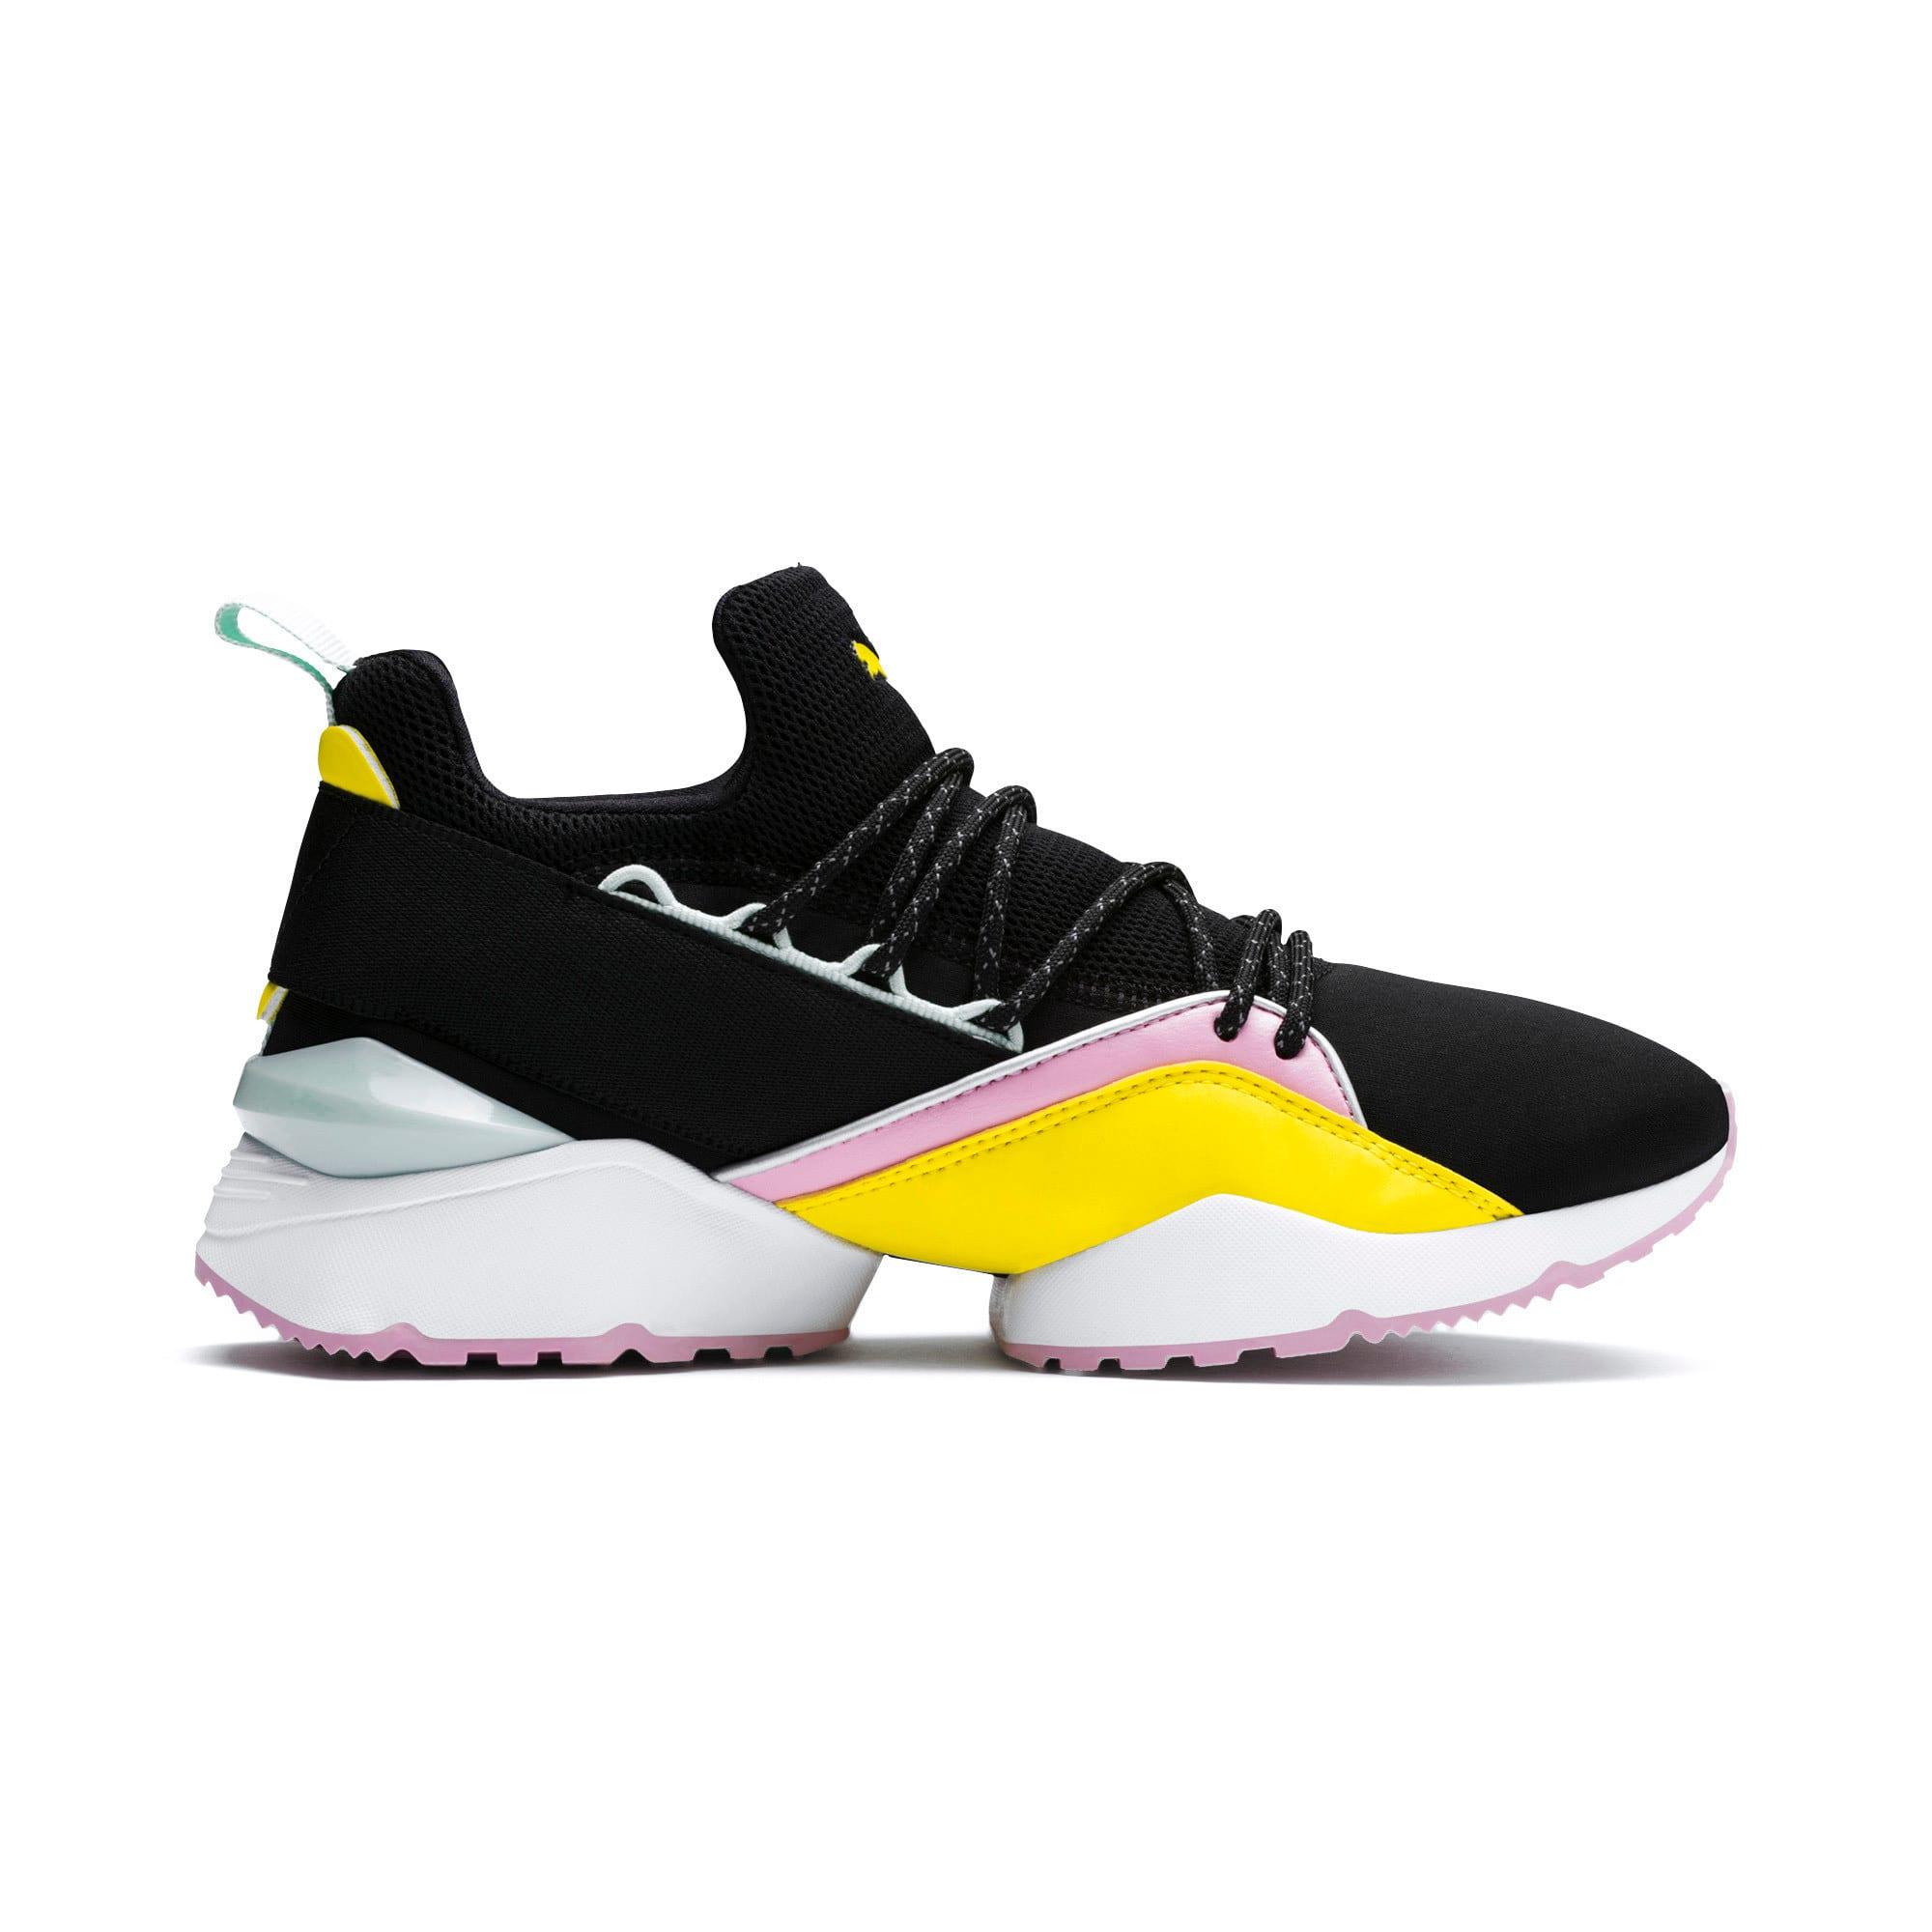 Thumbnail 6 of Muse Maia TZ Damen Sneaker, Puma Black-Blazing Yellow, medium